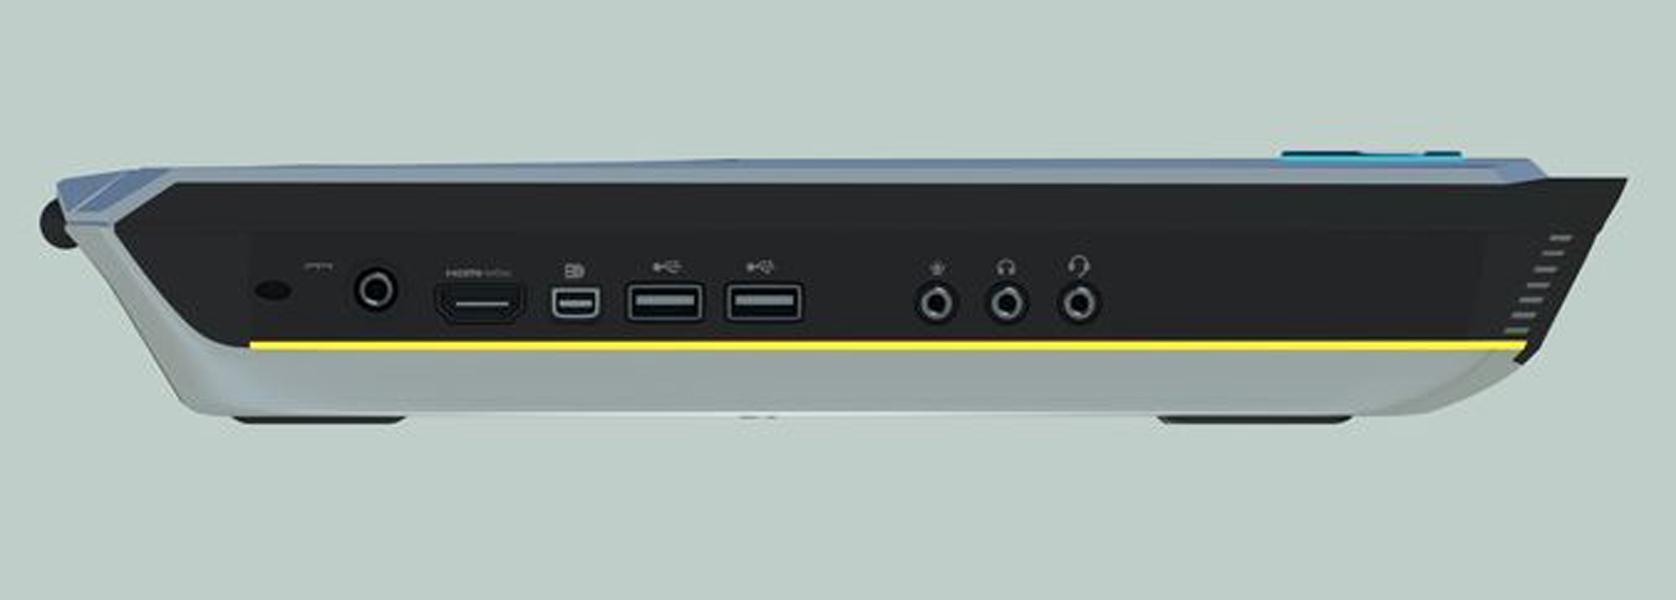 alienware-18-gaming-laptop-9